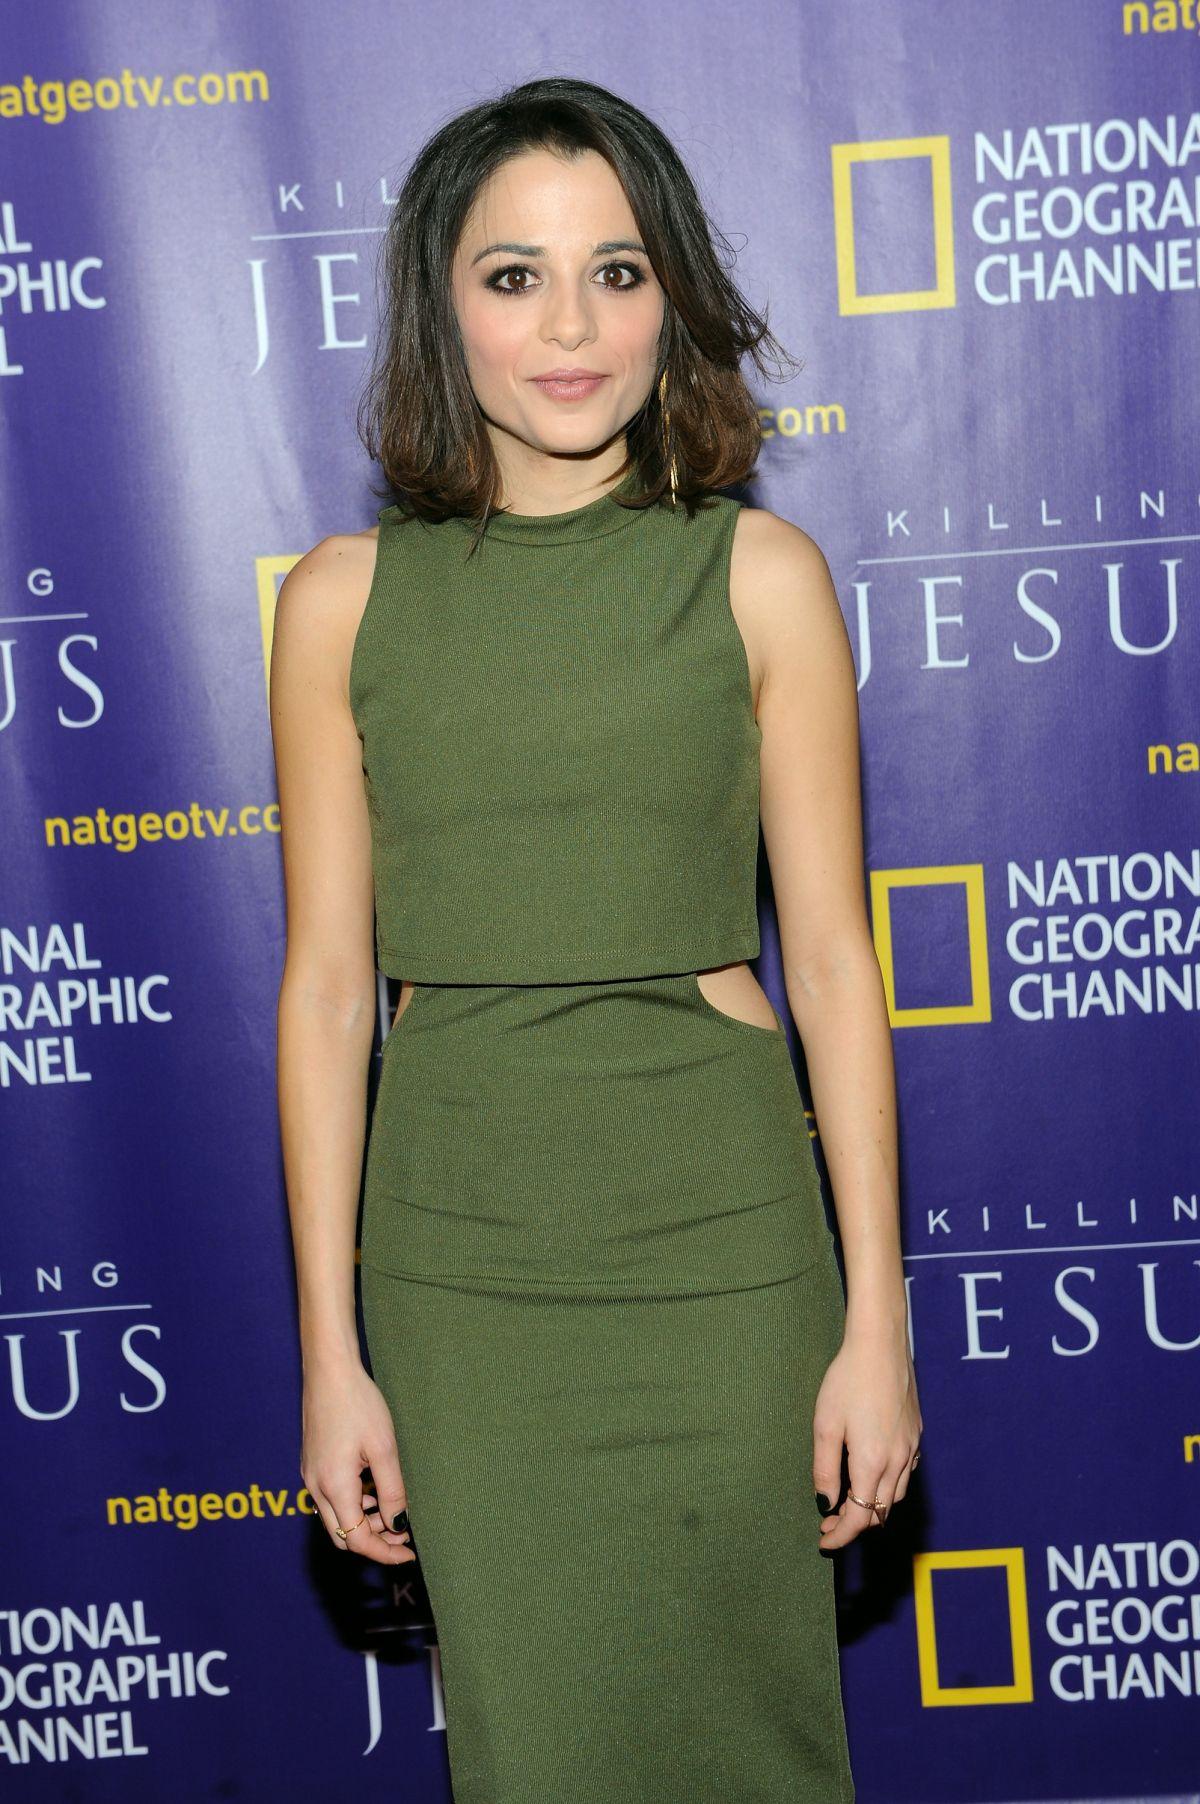 STEPHANIE LEONIDAS at Killing Jesus Premiere in New York